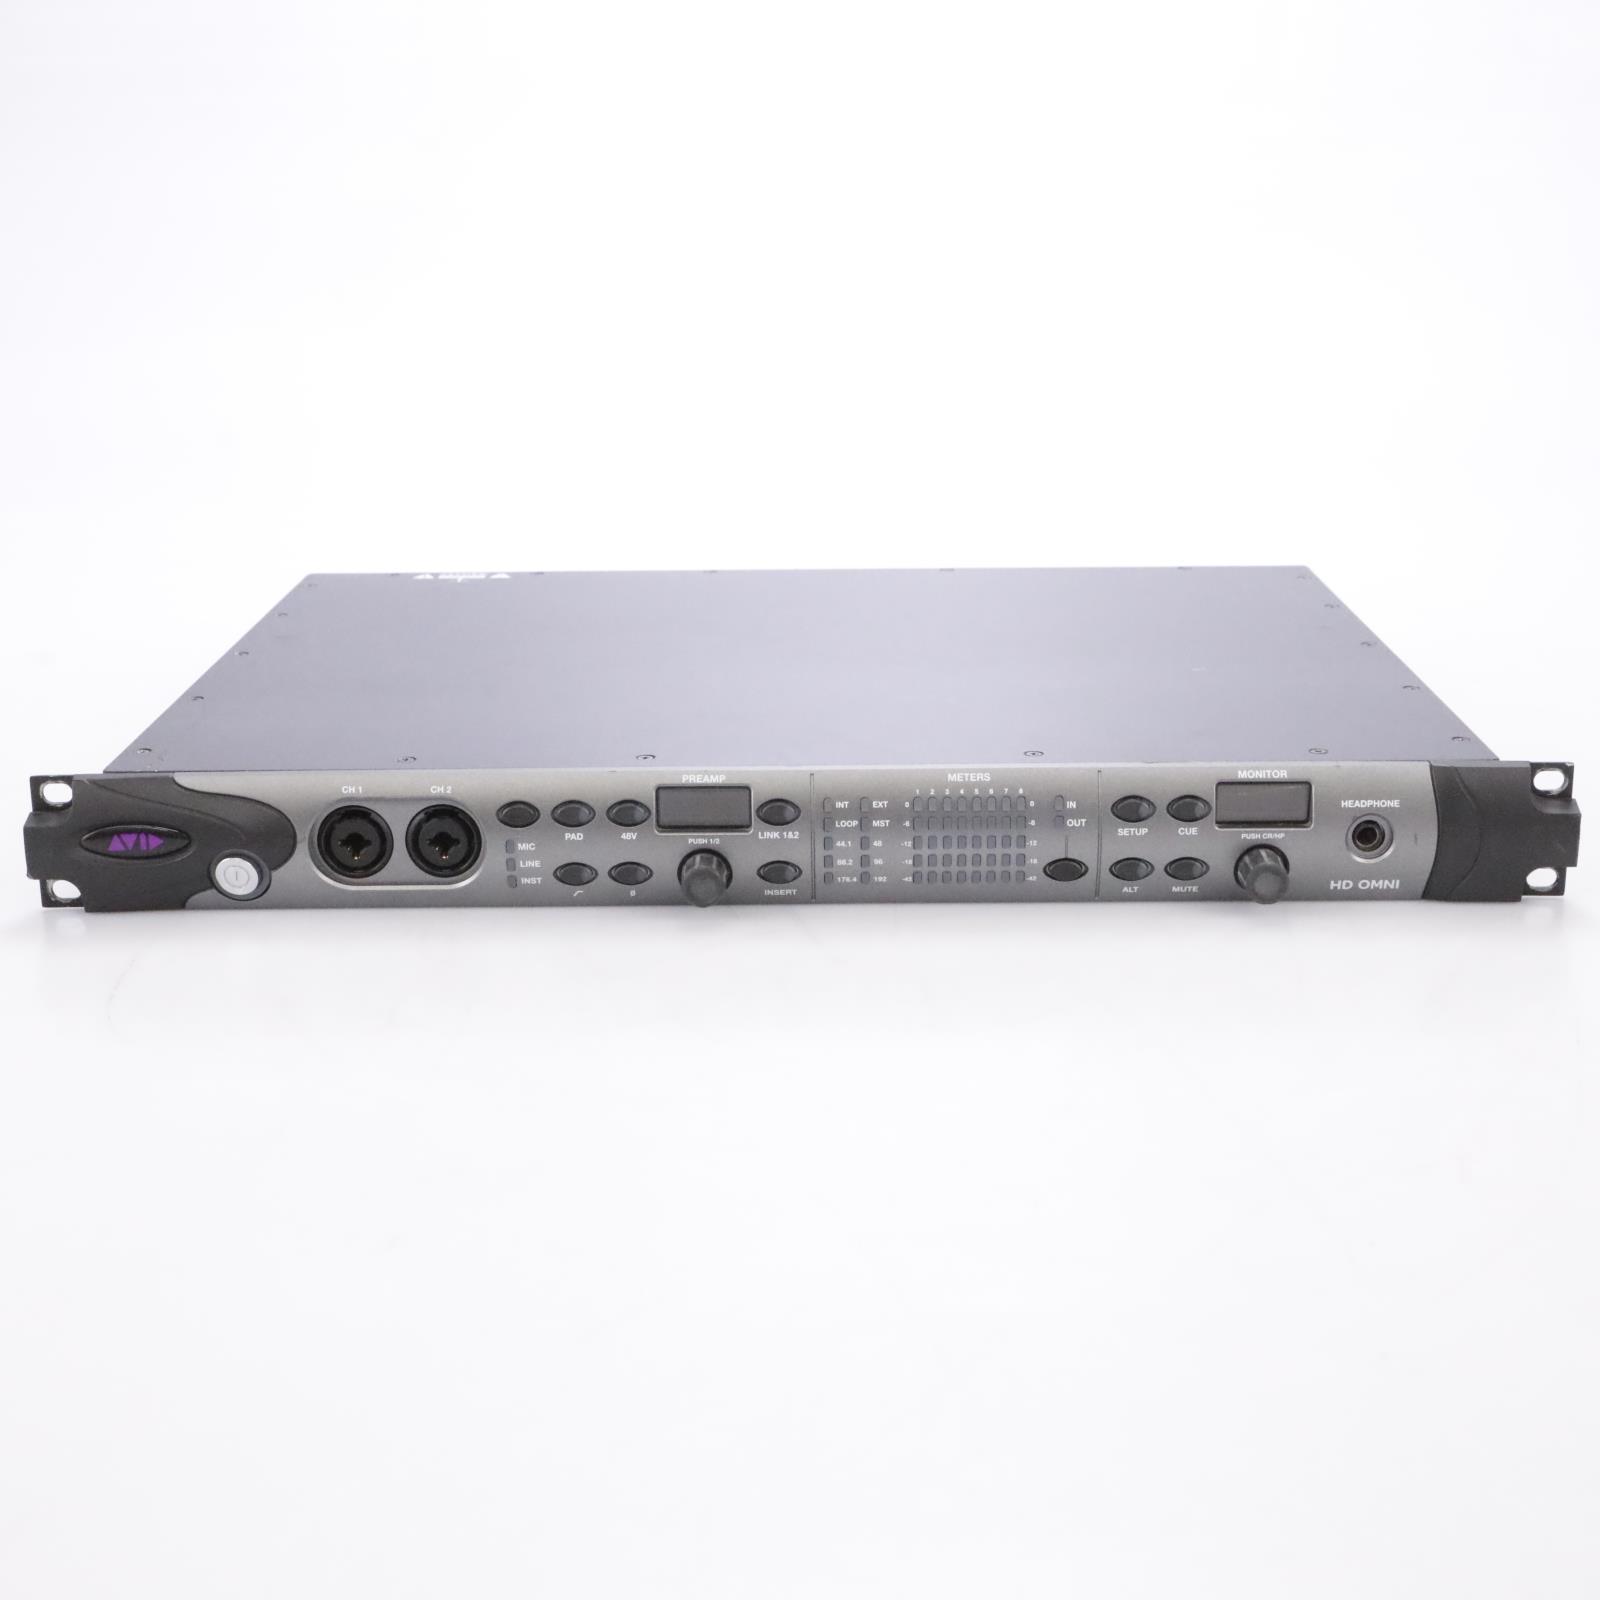 Avid HD OMNI Pro Tools HD / HDX Audio Interface w/ DigiLink Cable #43824